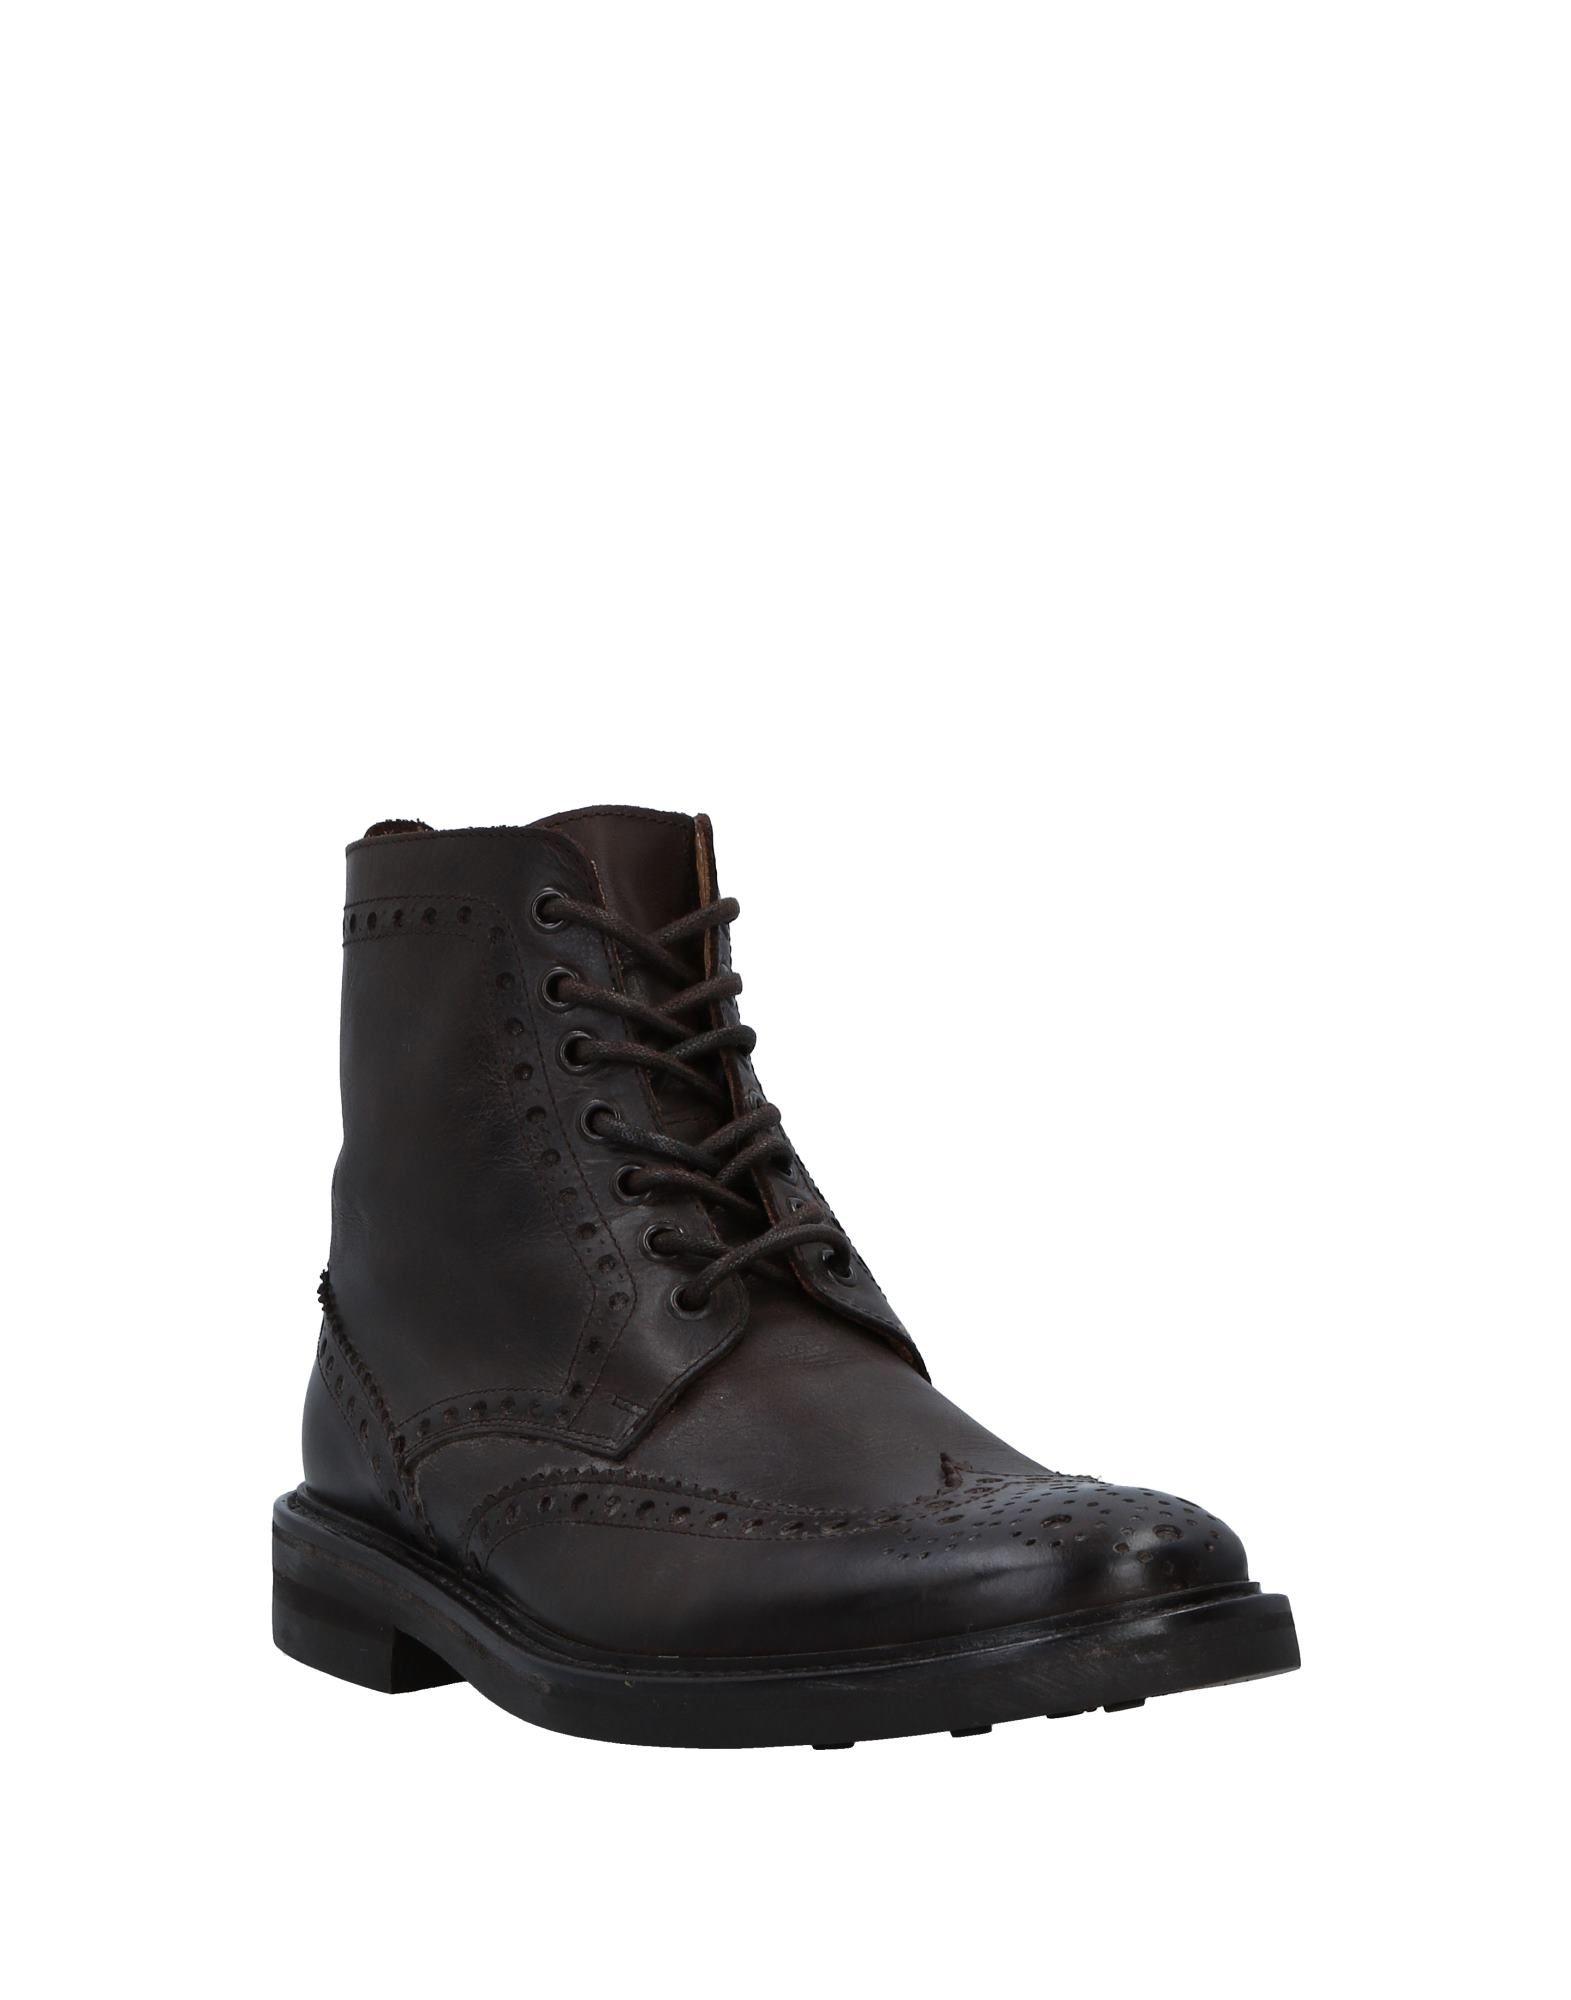 Rabatt echte  Schuhe Seboy's Stiefelette Herren  echte 11533247EH 6e1687